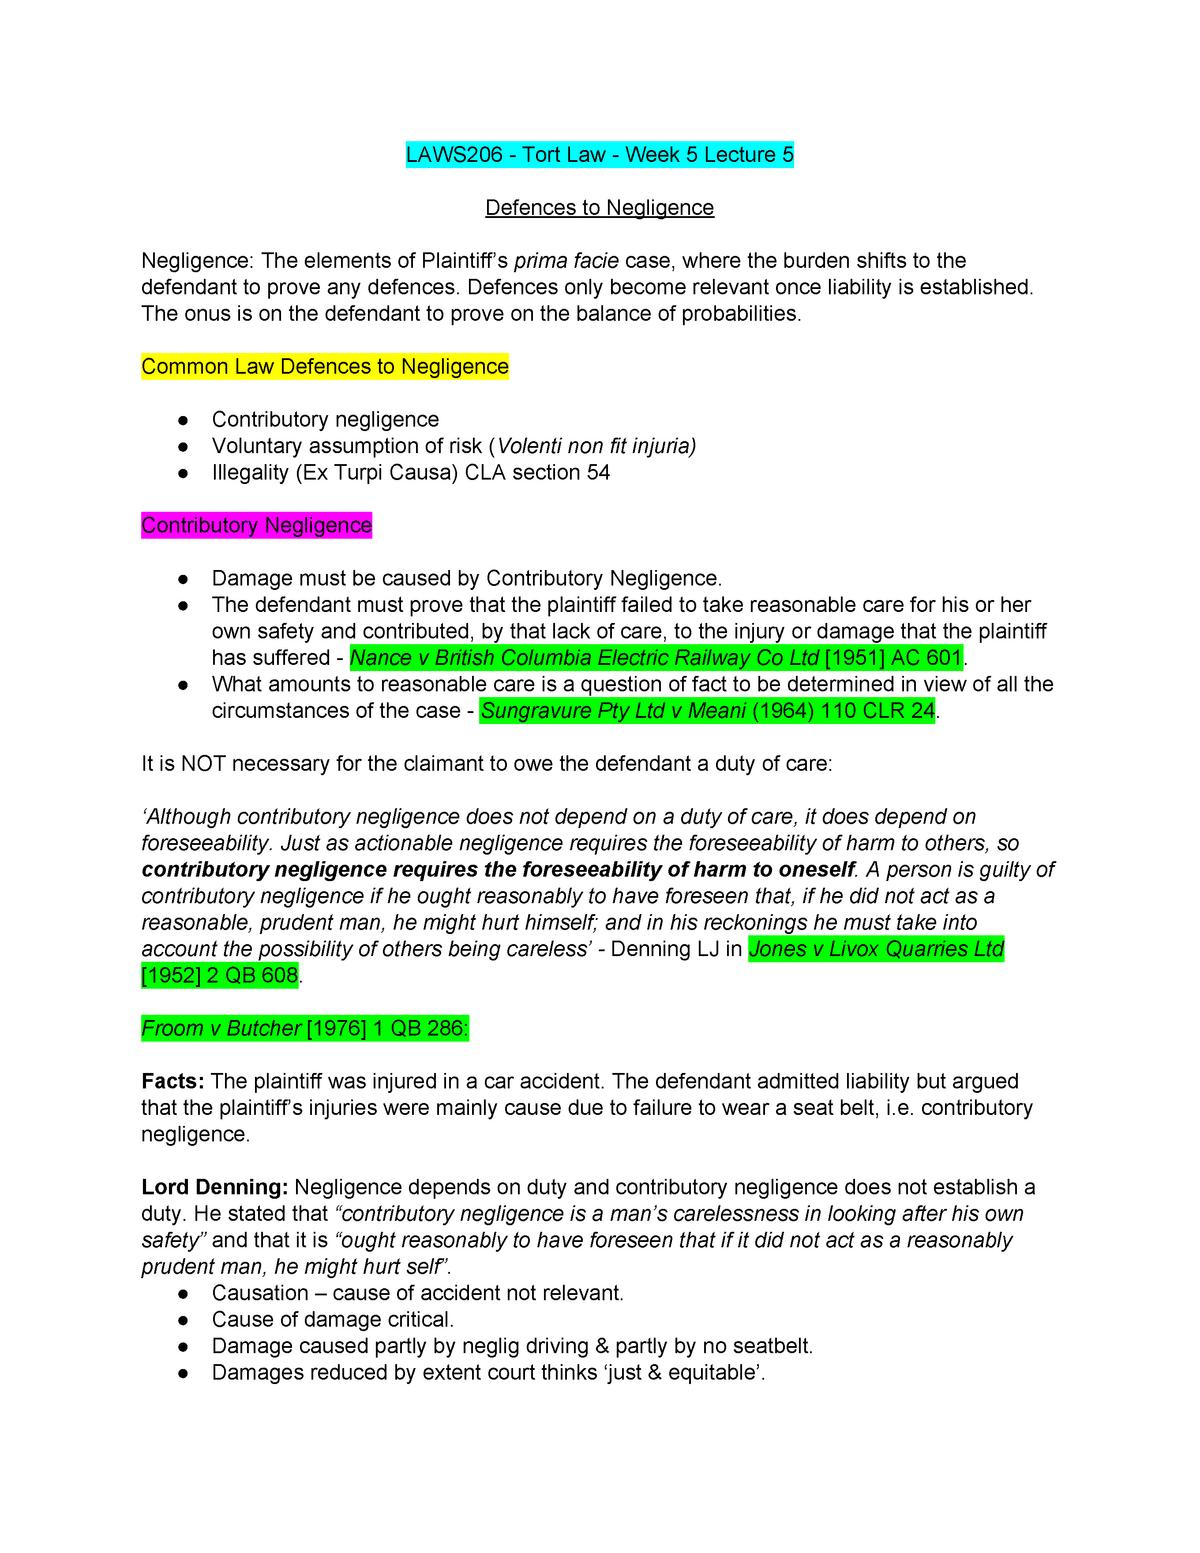 LAWS206 EXAM Notes - Torts - ACU - StuDocu